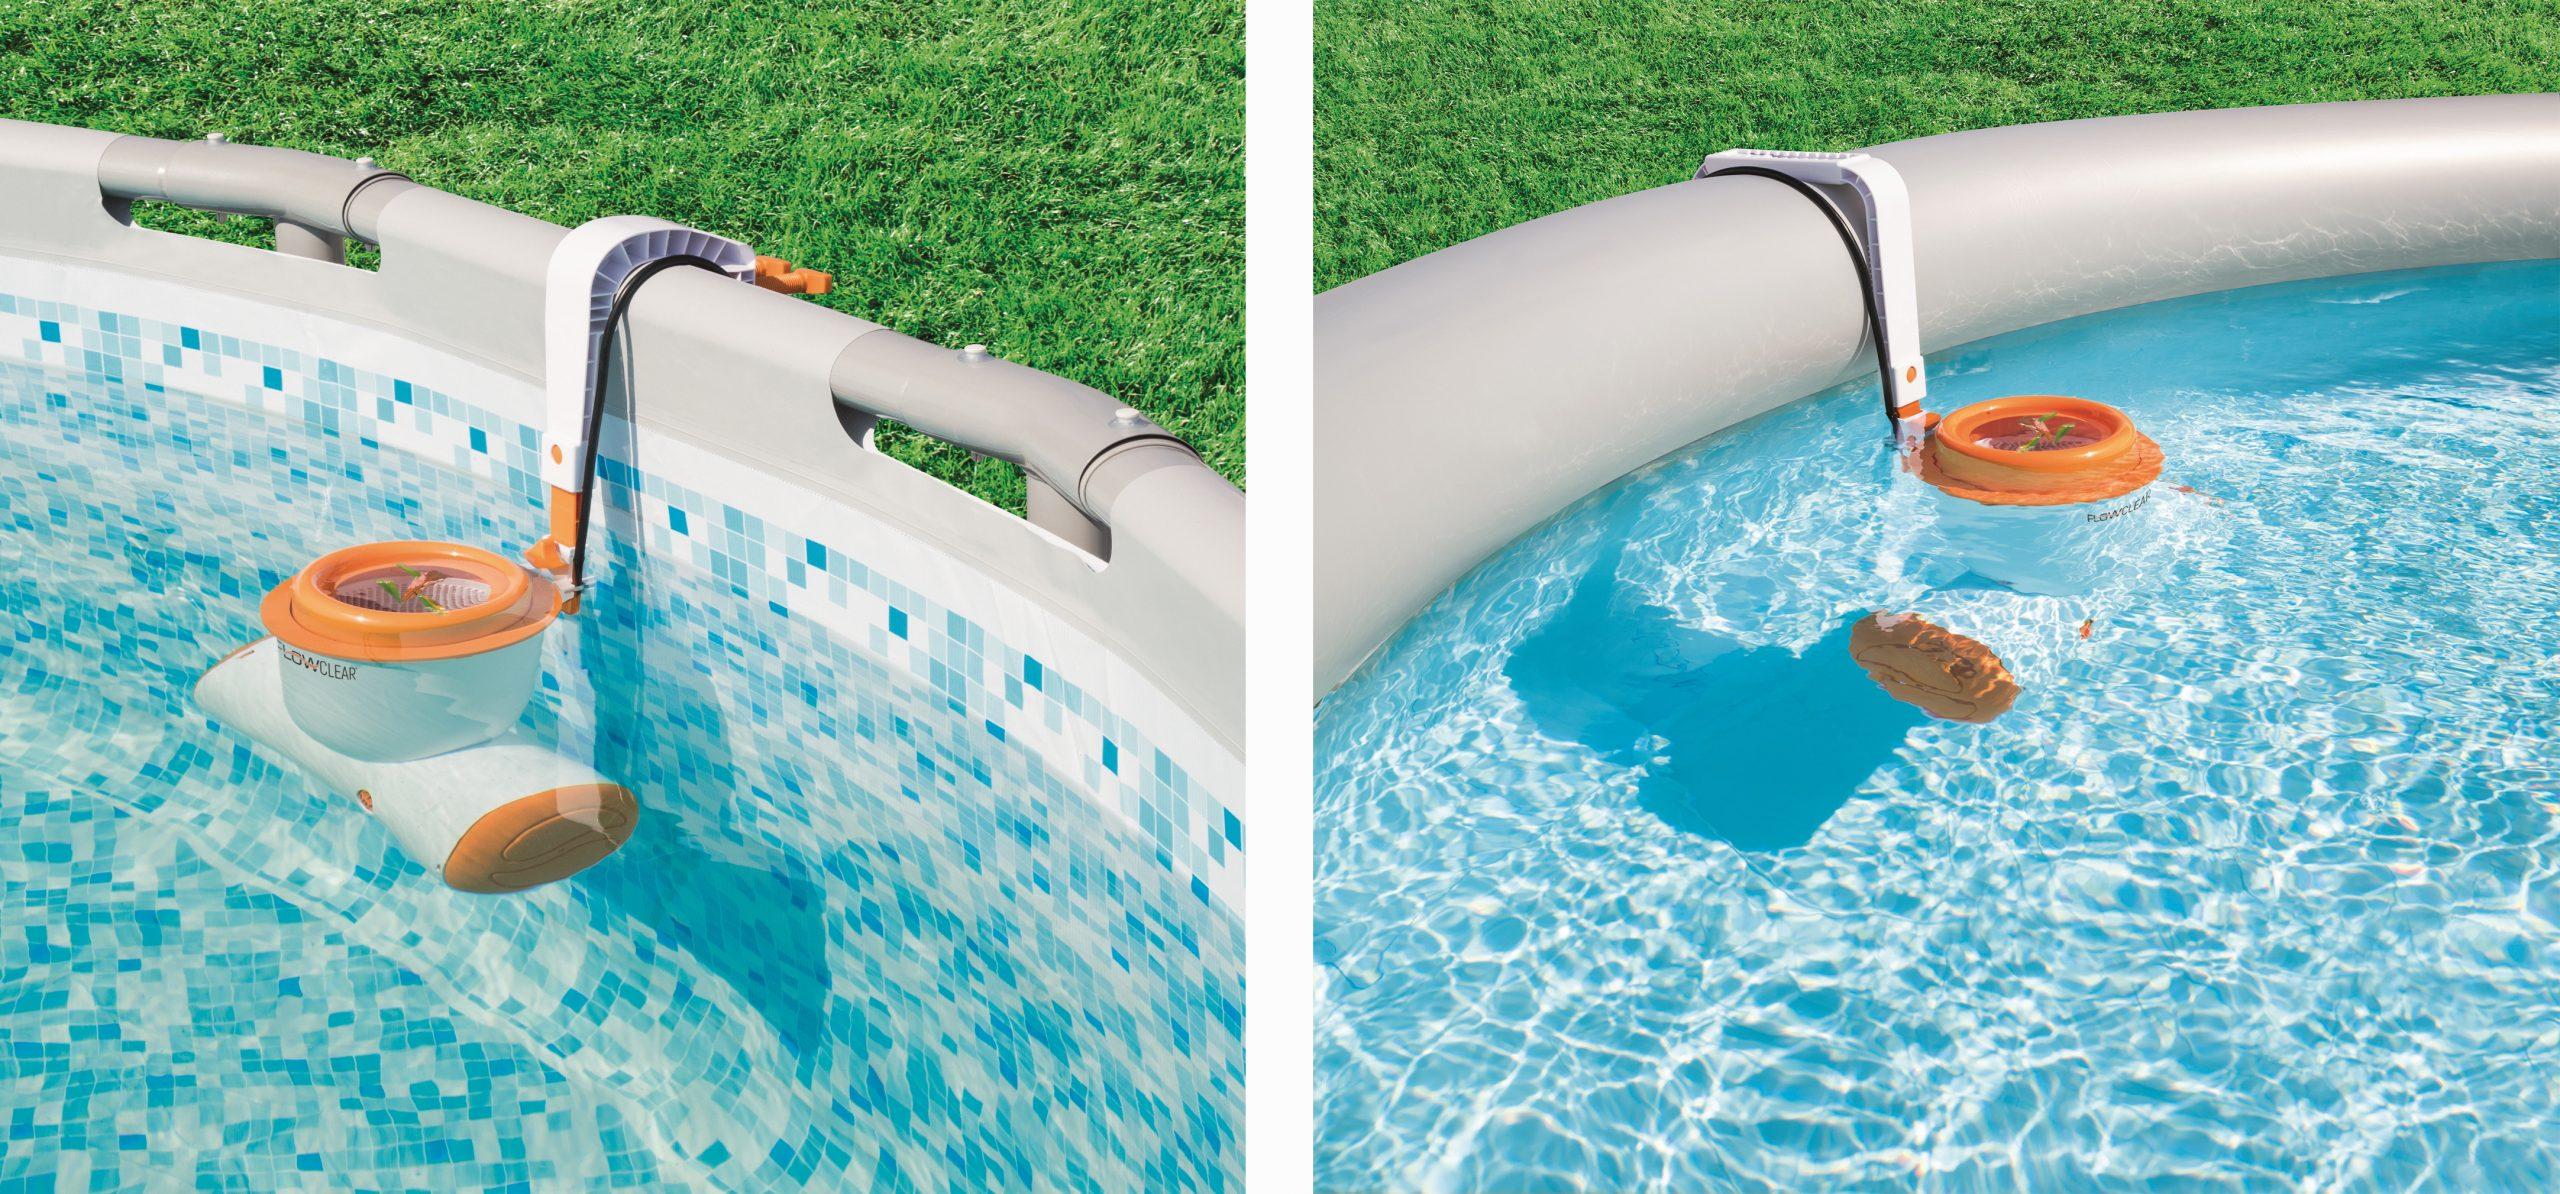 Bestway Skimatic Submersible Cartridge Filter 2,574 L/h à Filtre Piscine Bestway Type 2